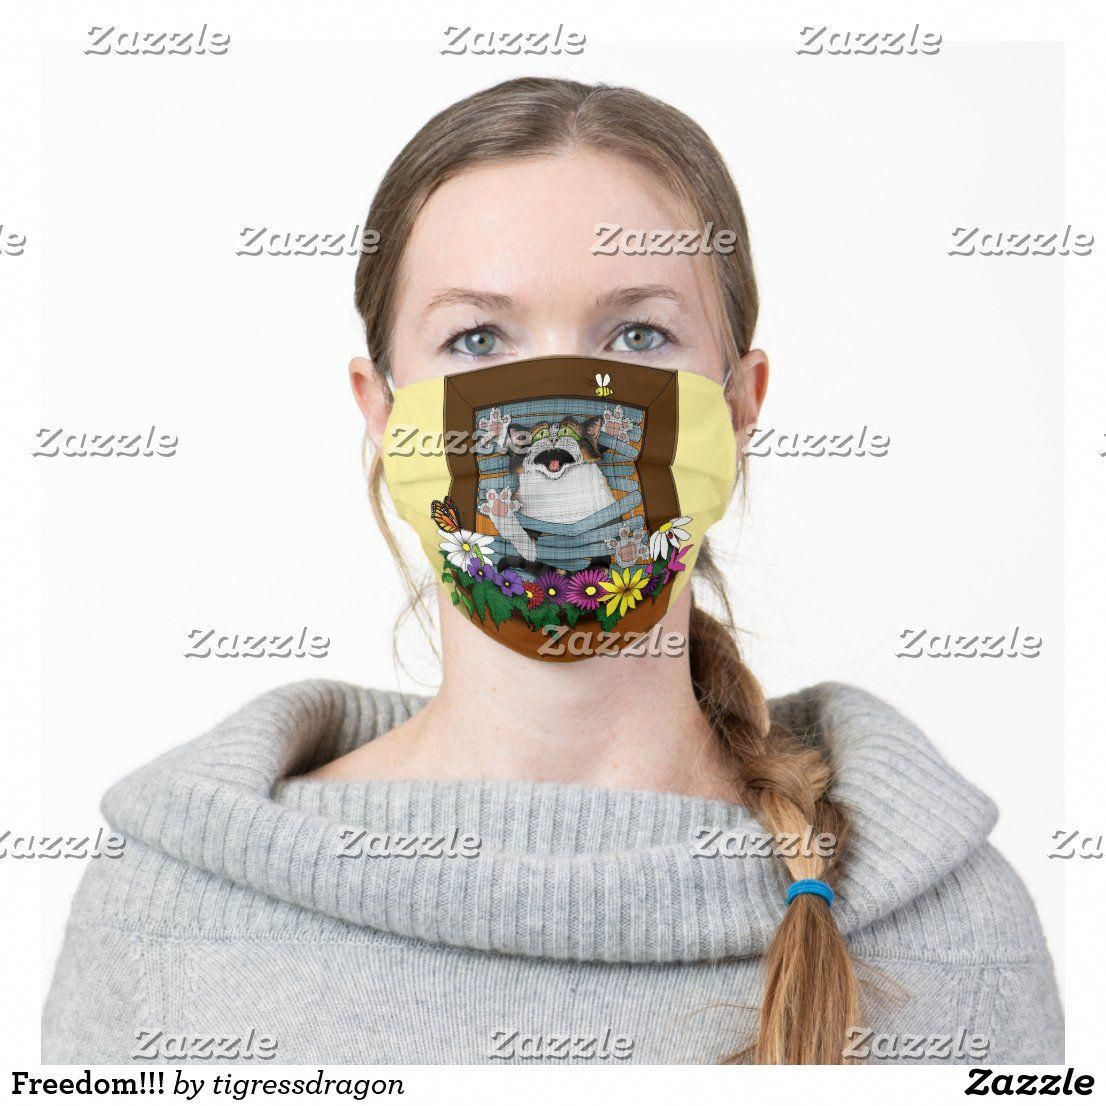 n95 face mask maker in 2020 Simple face, Diy face mask